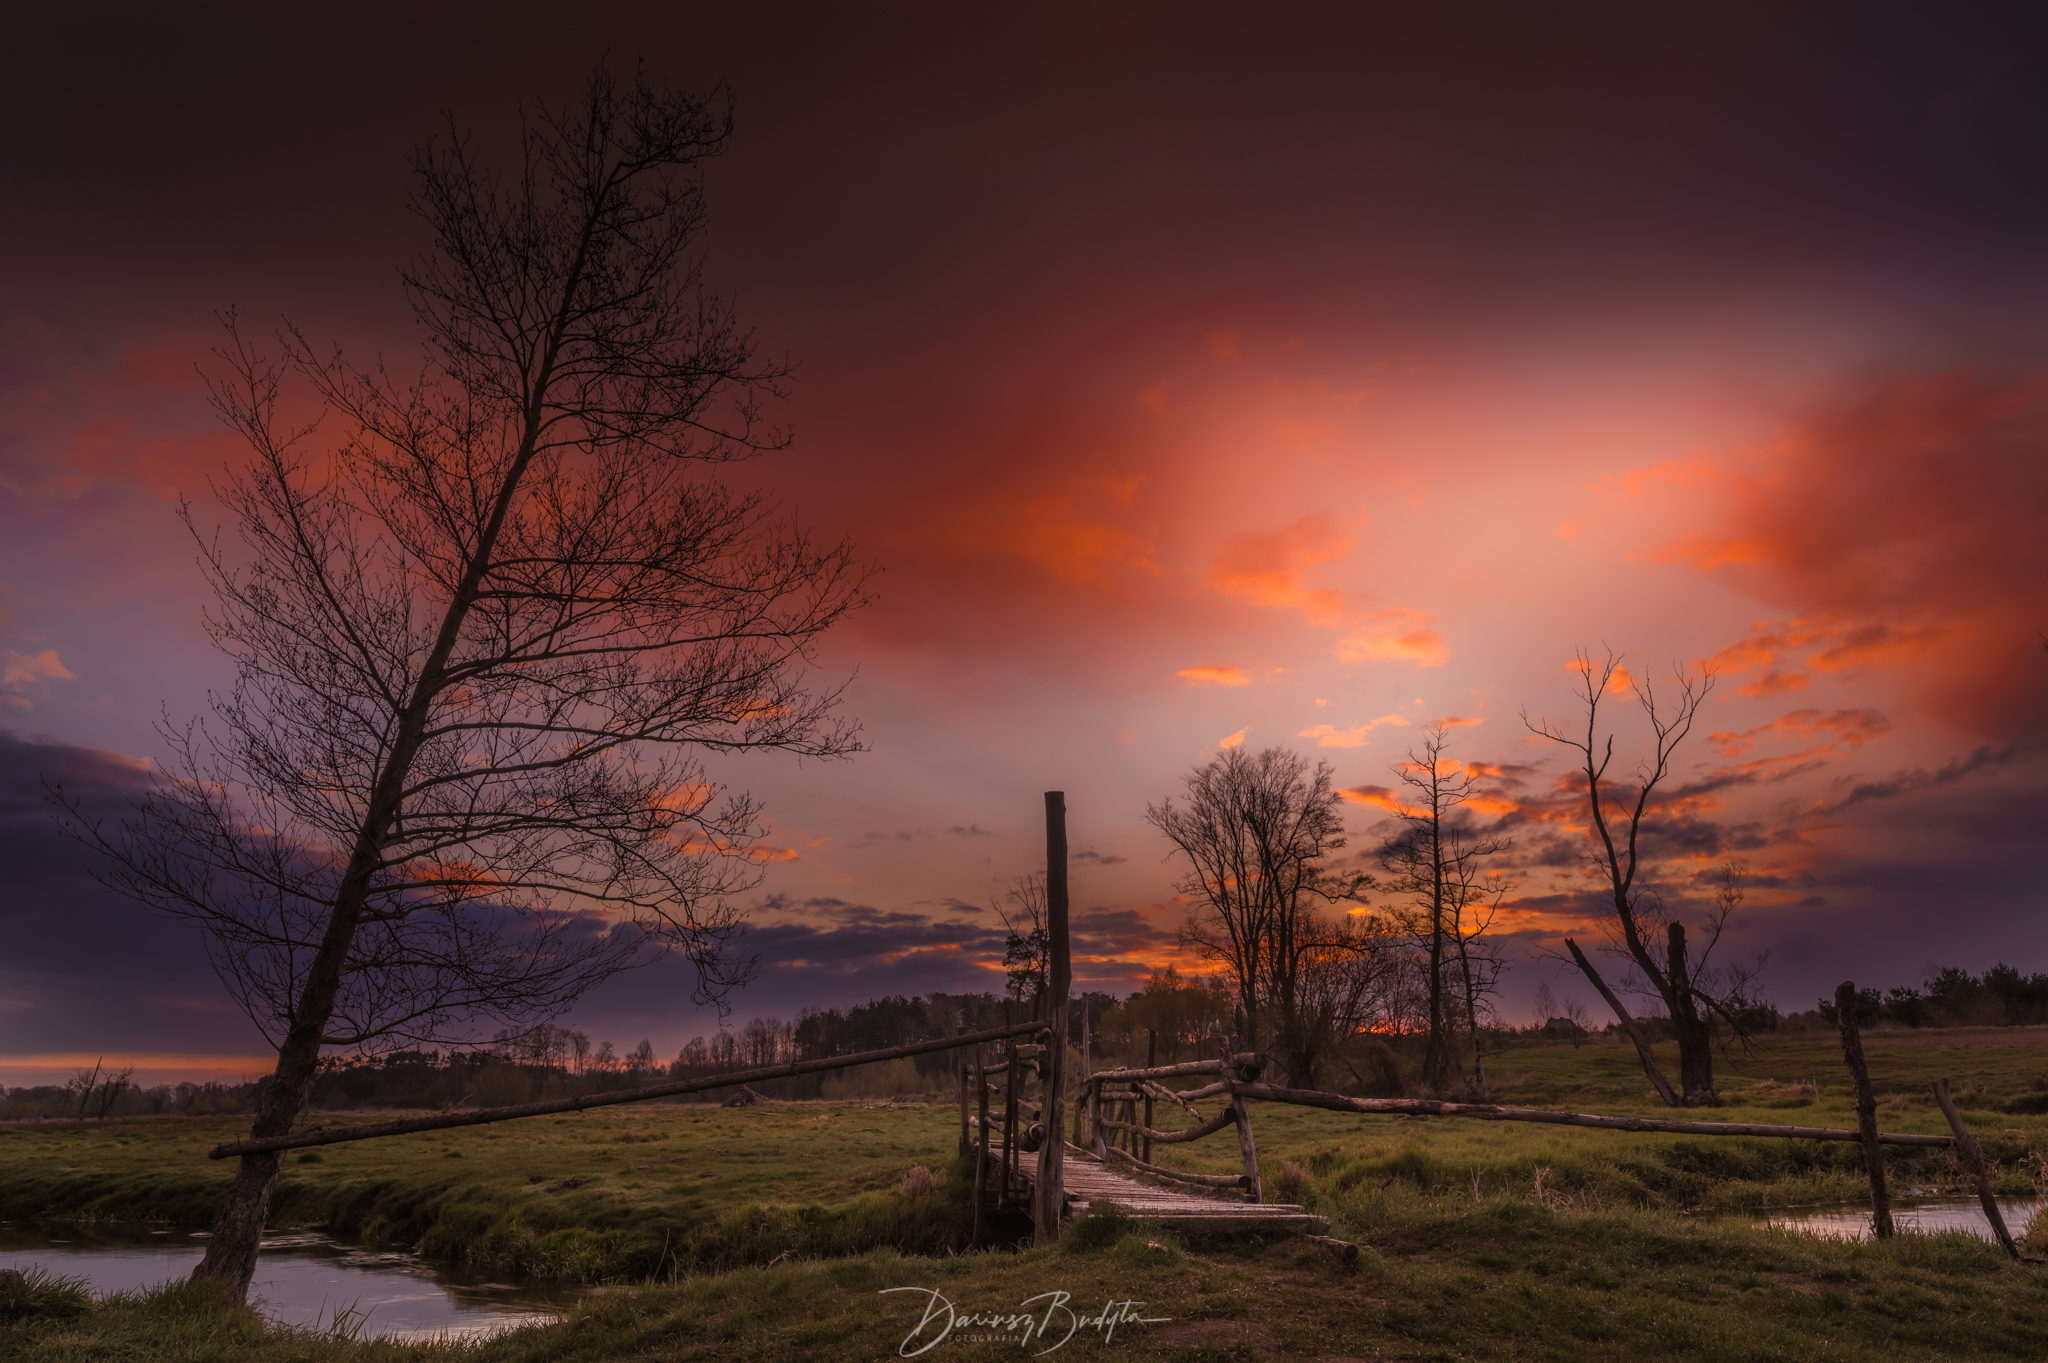 sunrise, spring, river, jeziorka, sky,, Budyta Dariusz